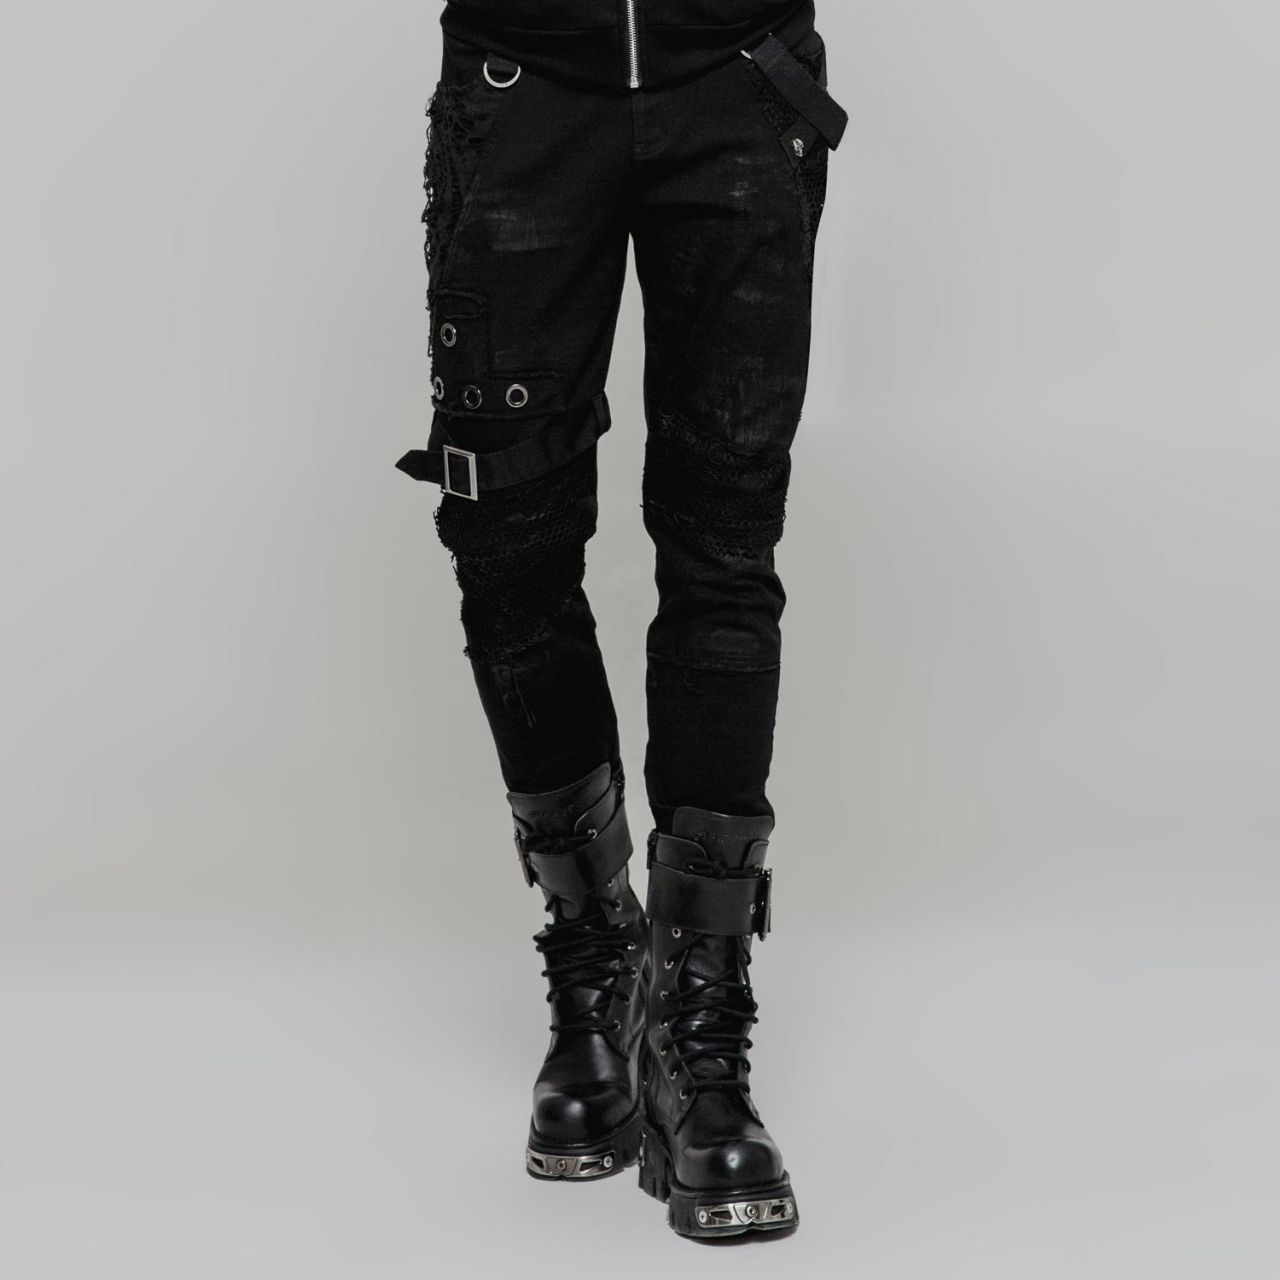 Gothic Style Slim Fit Hose im Punk Vintage Look   VOODOOMANIACS